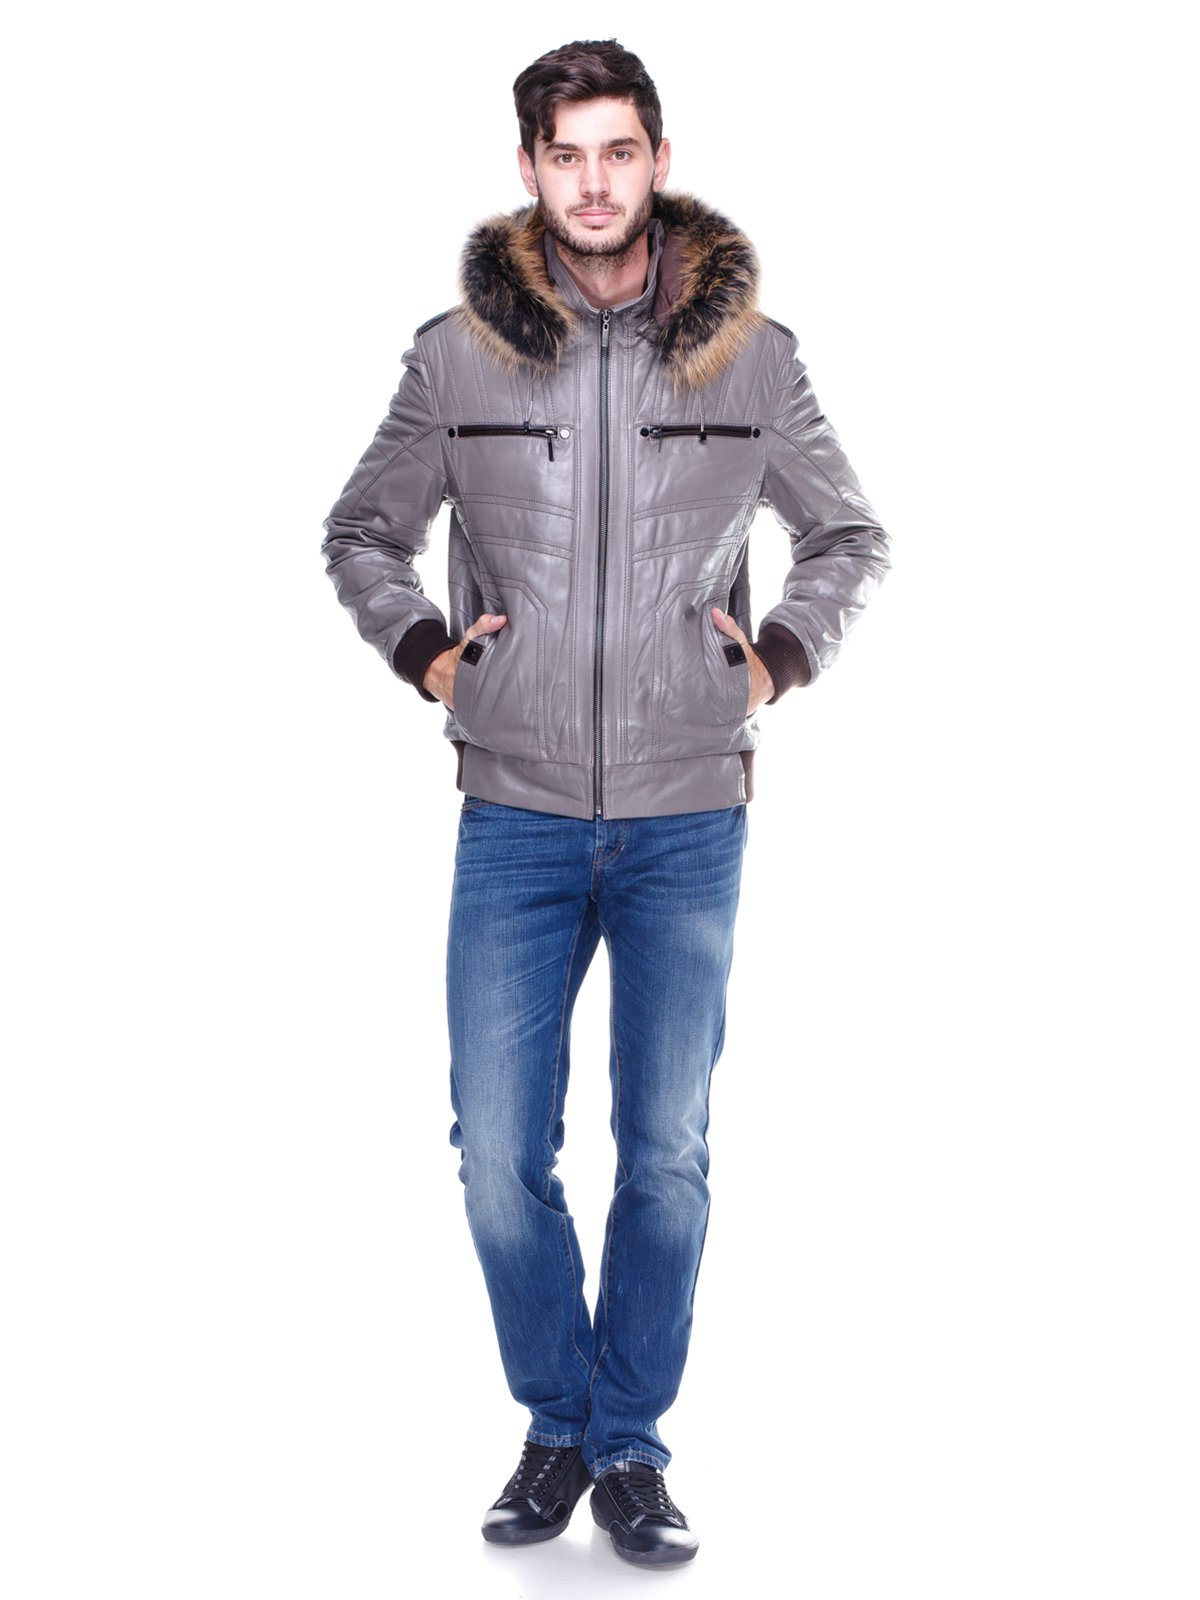 Куртка сіра з оздобленим хутром капюшоном   1830355   фото 4